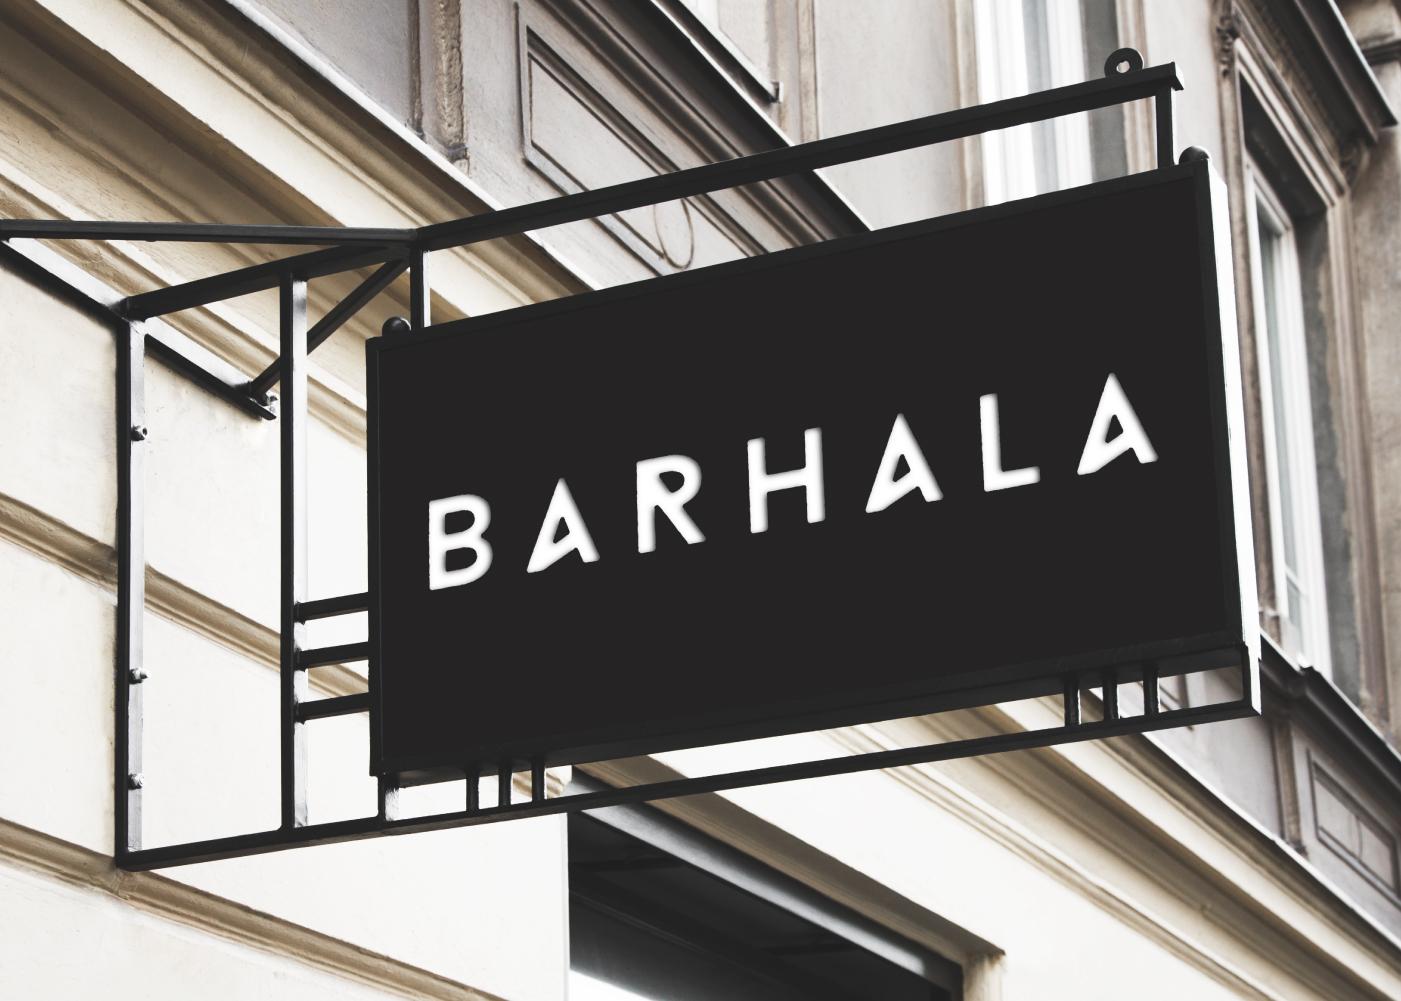 barhala-logo-marca-rotulo1